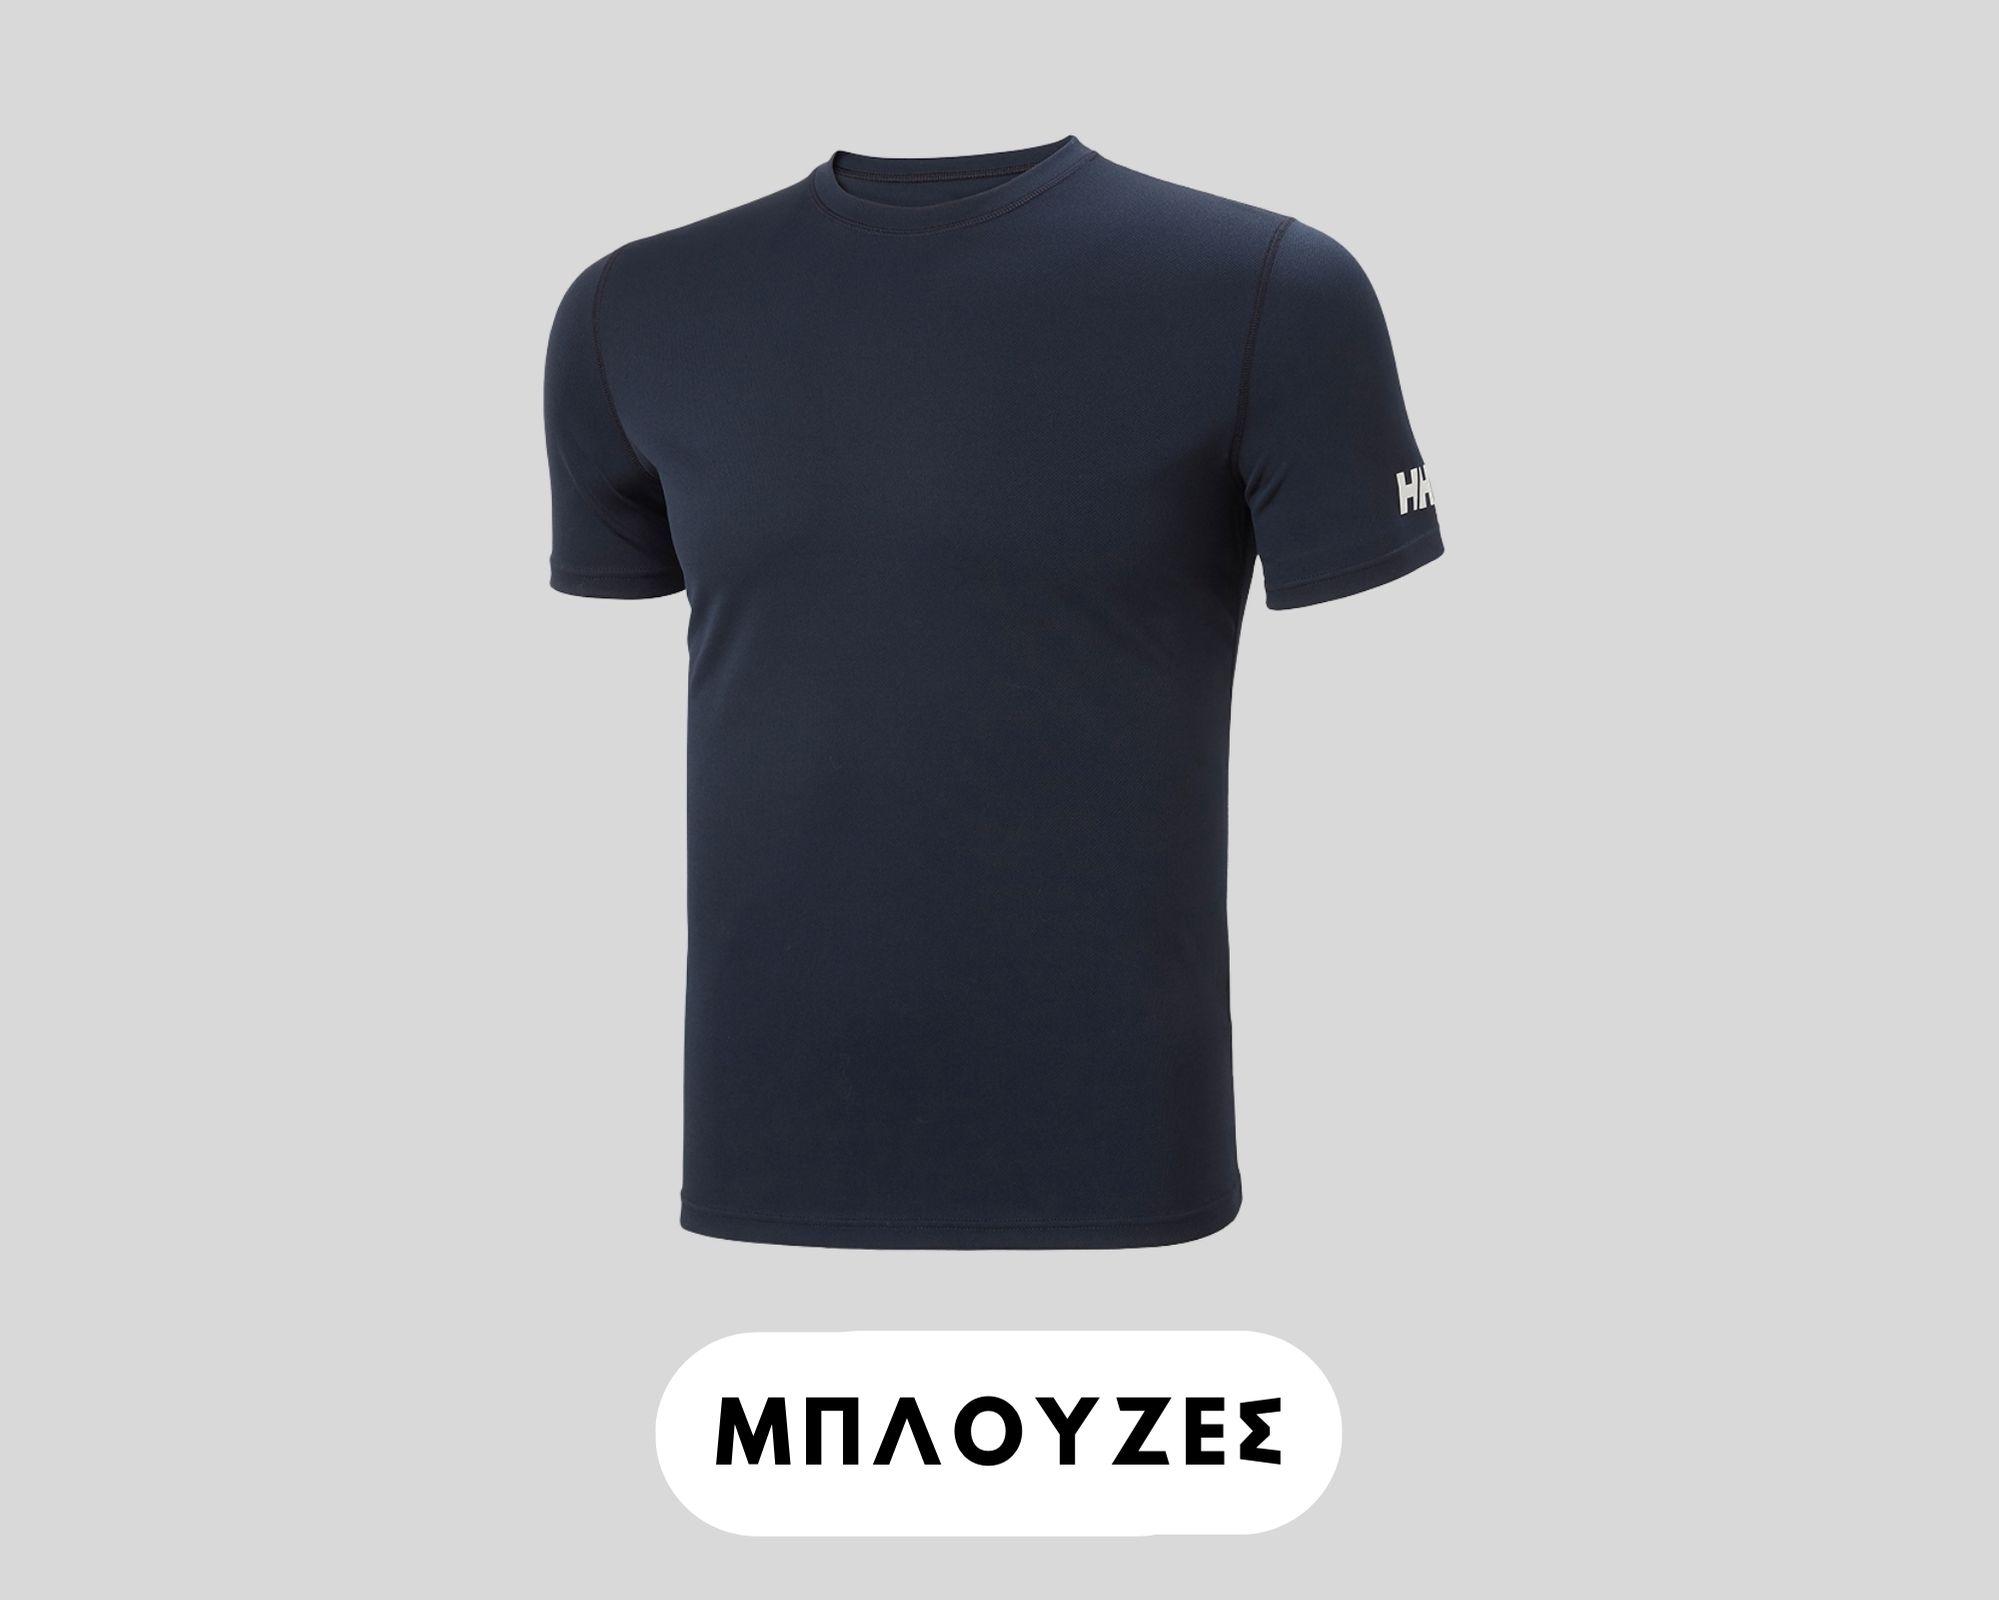 Dimitriadis Action Stores, t-shirts